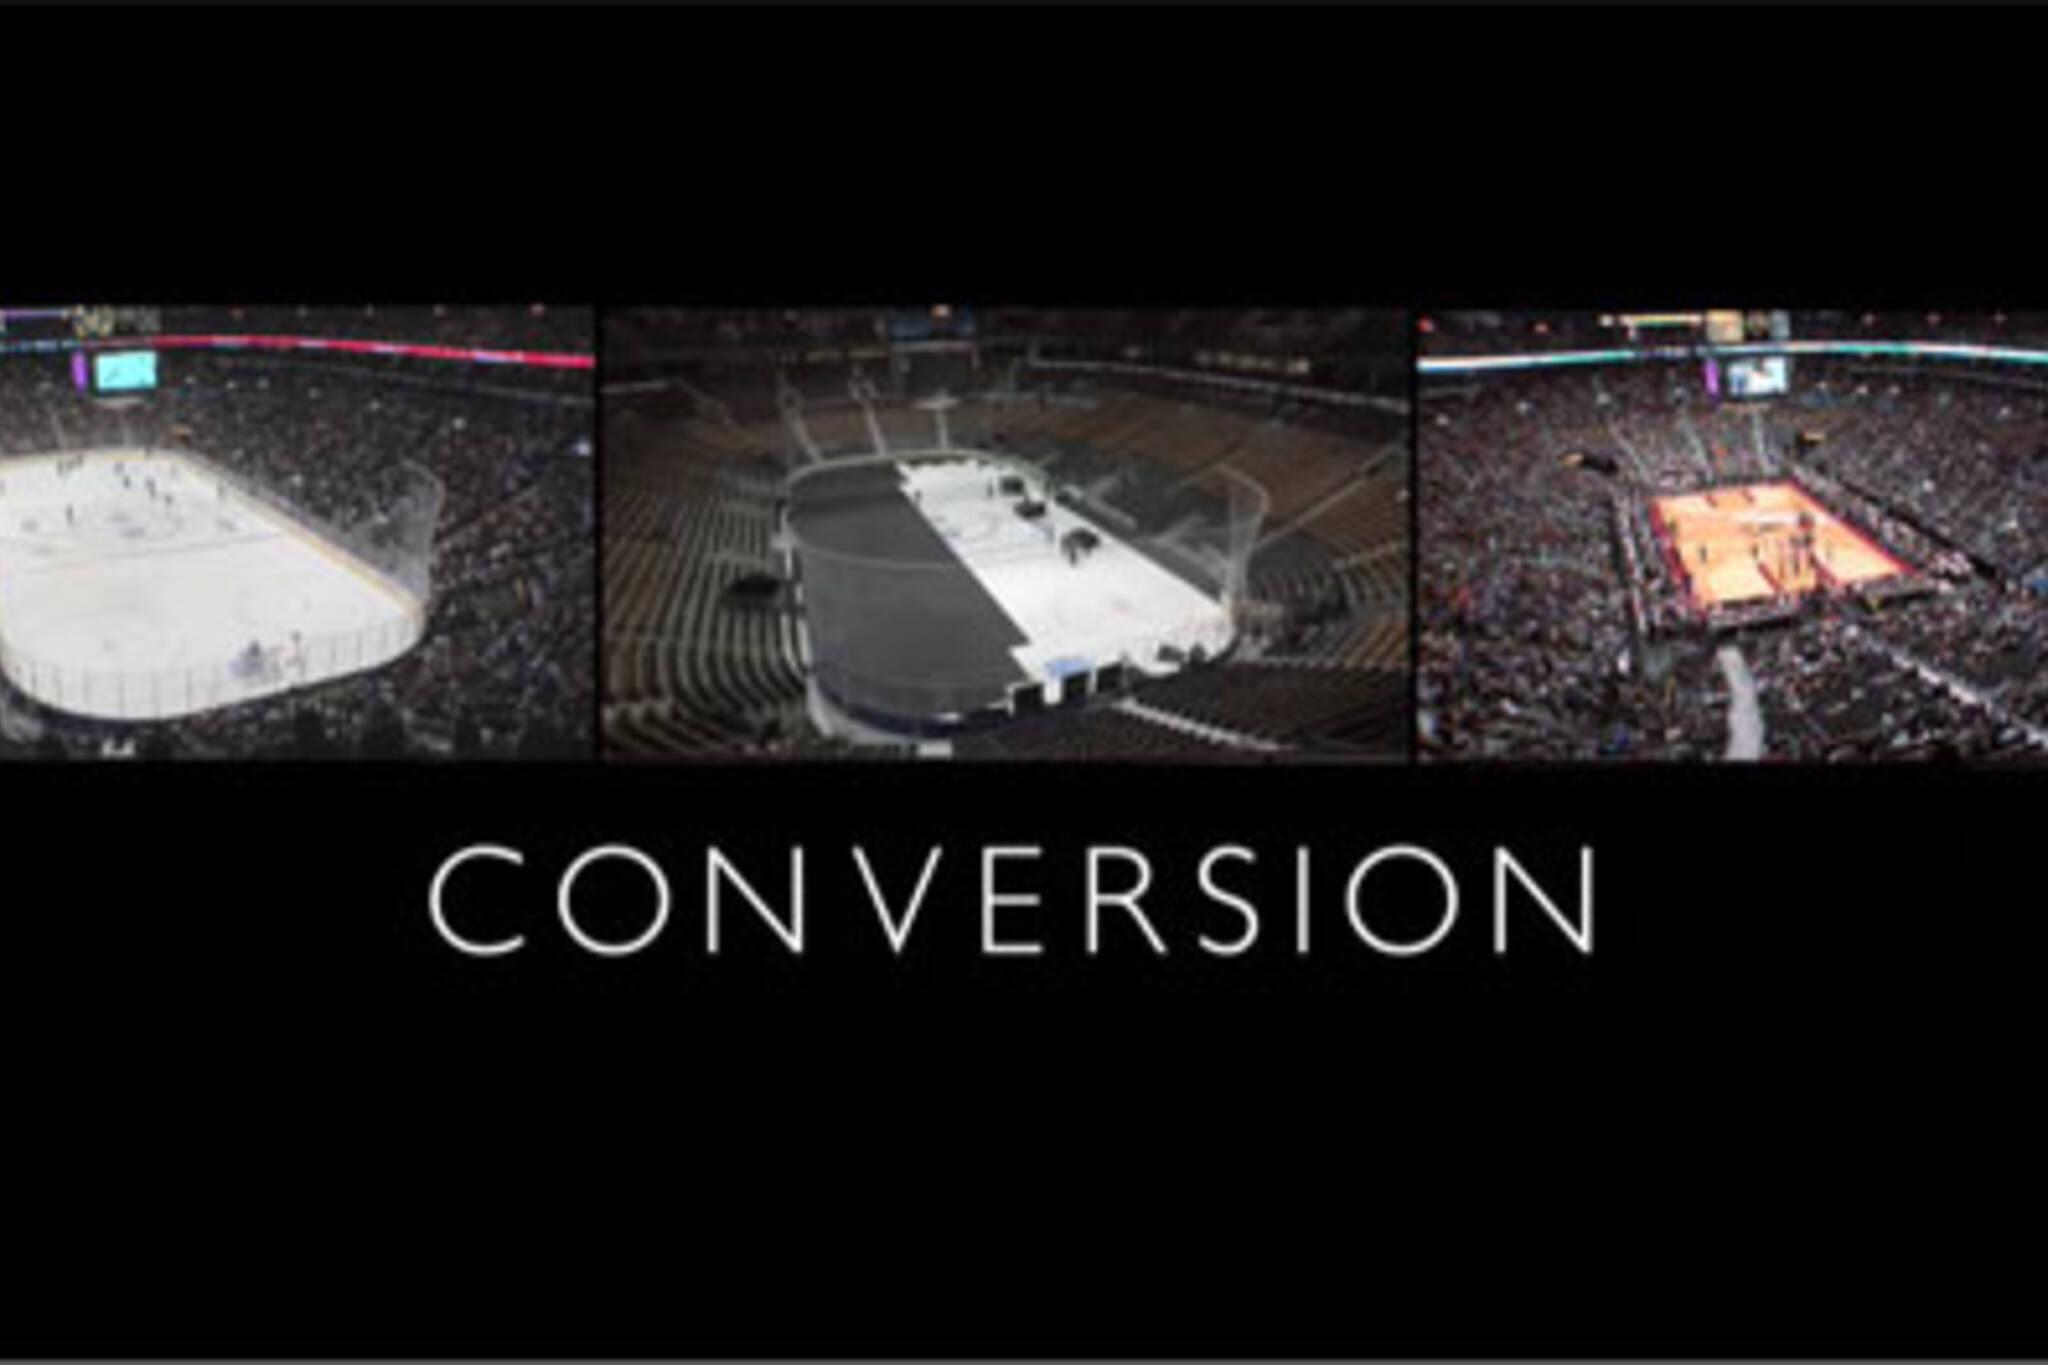 20070225_conversion.jpg